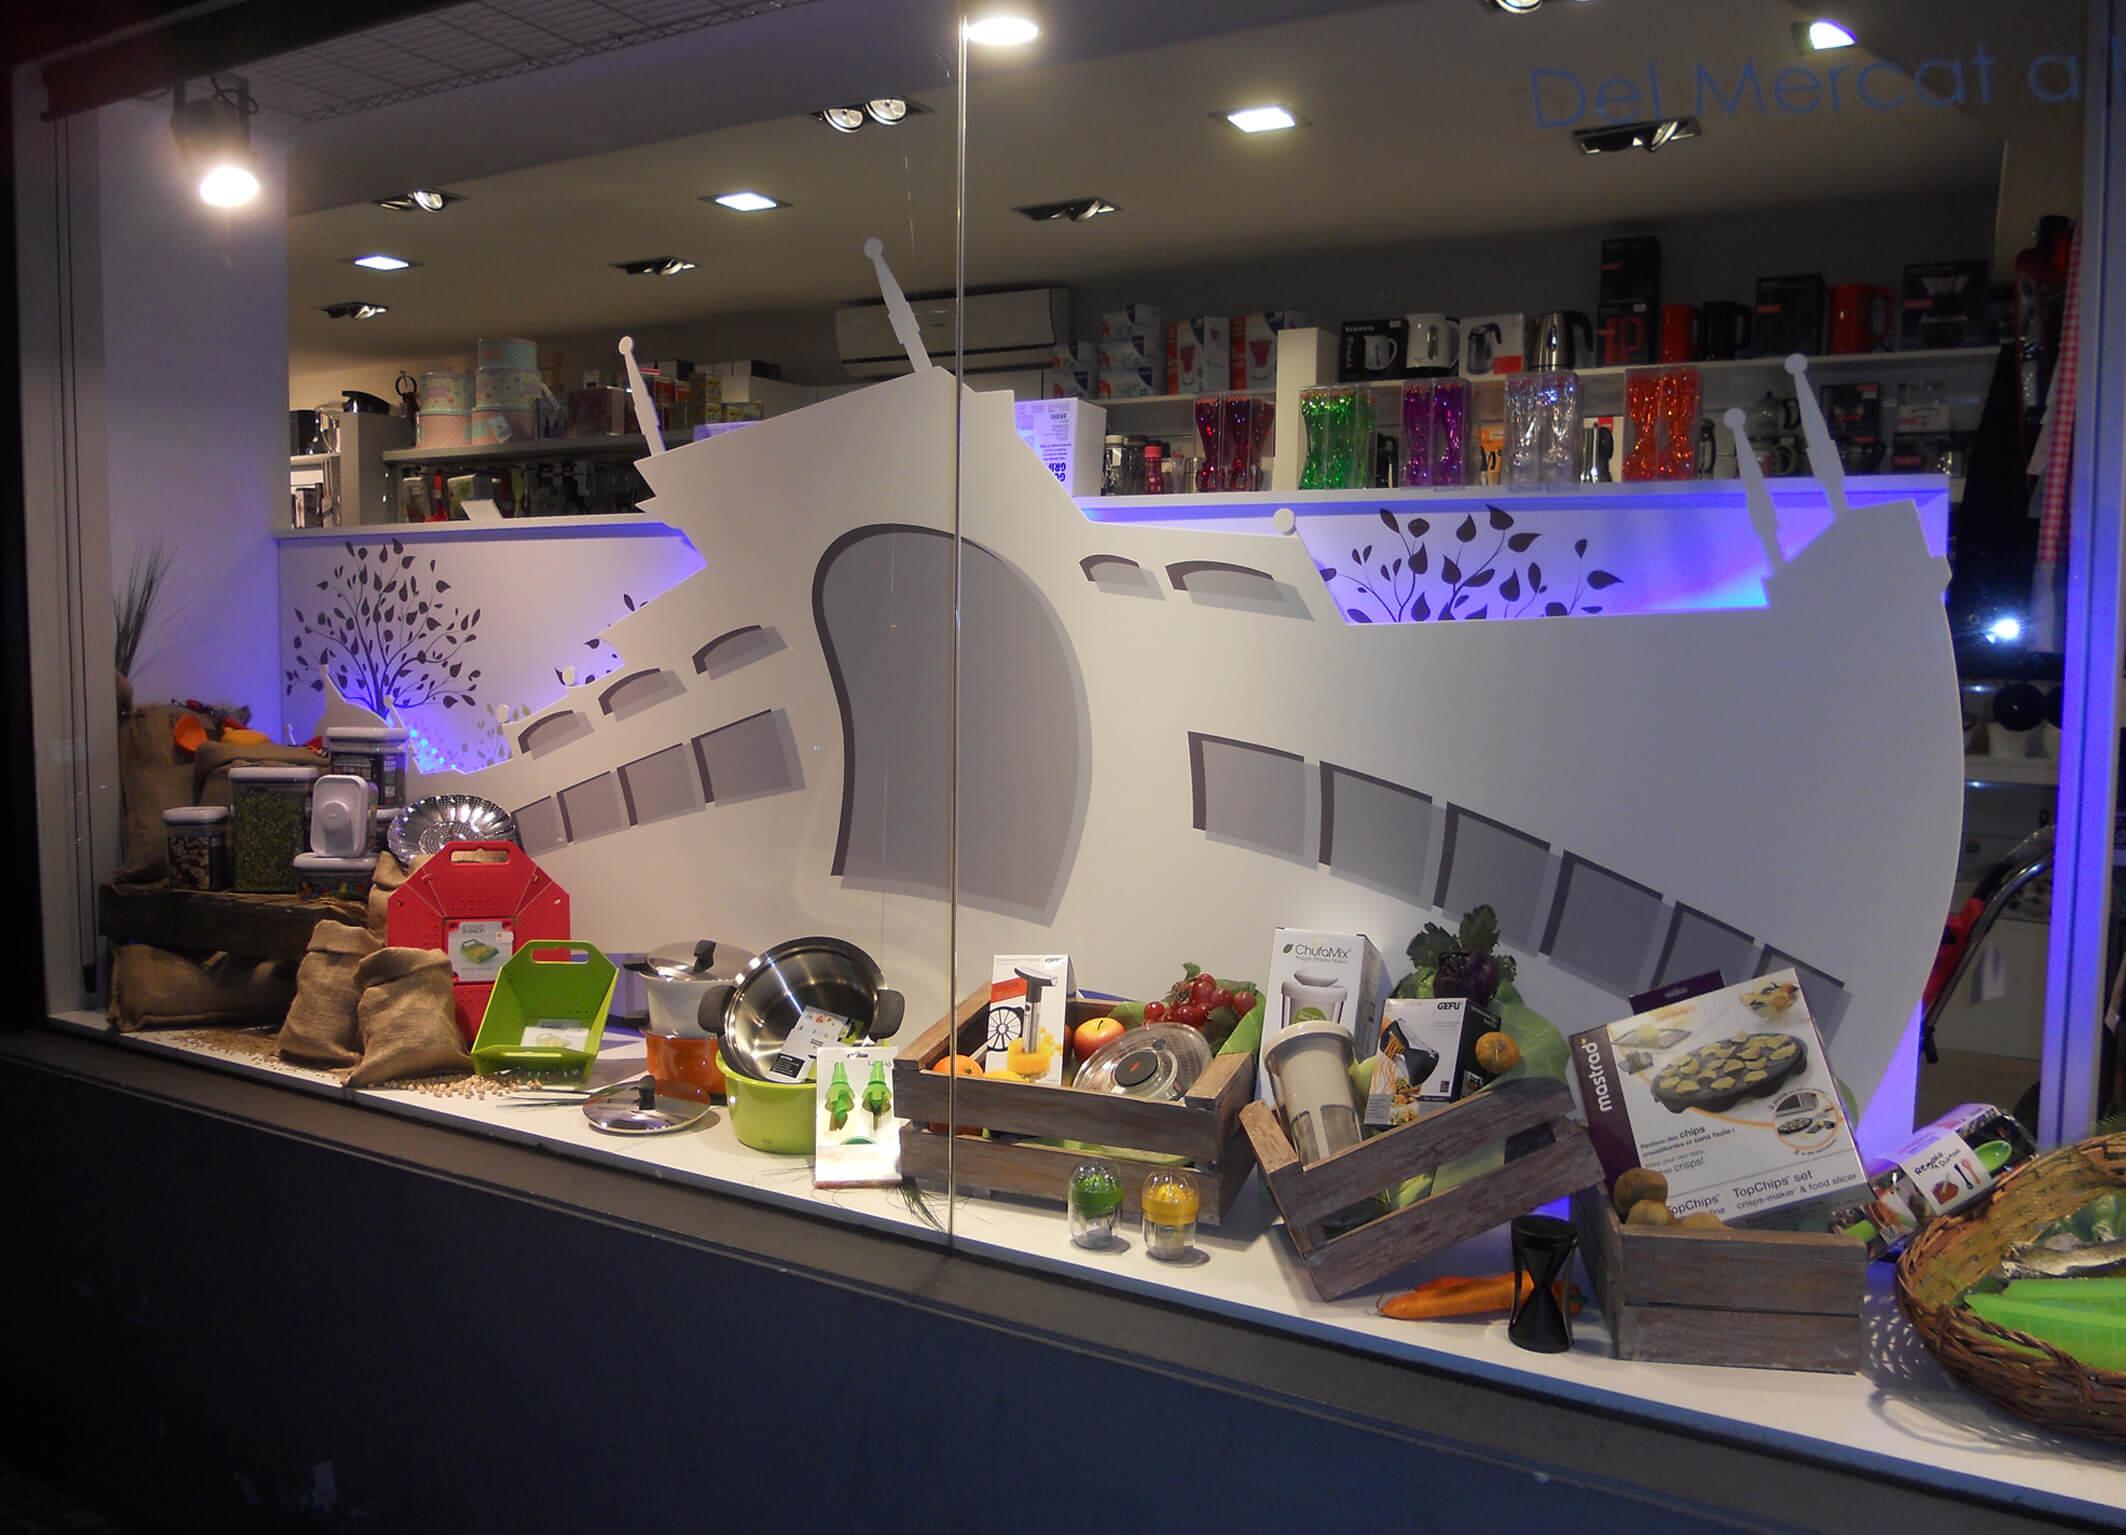 Escaparate cocina mercat sabadell tiendas de menaje hogar - Cocinas sabadell ...